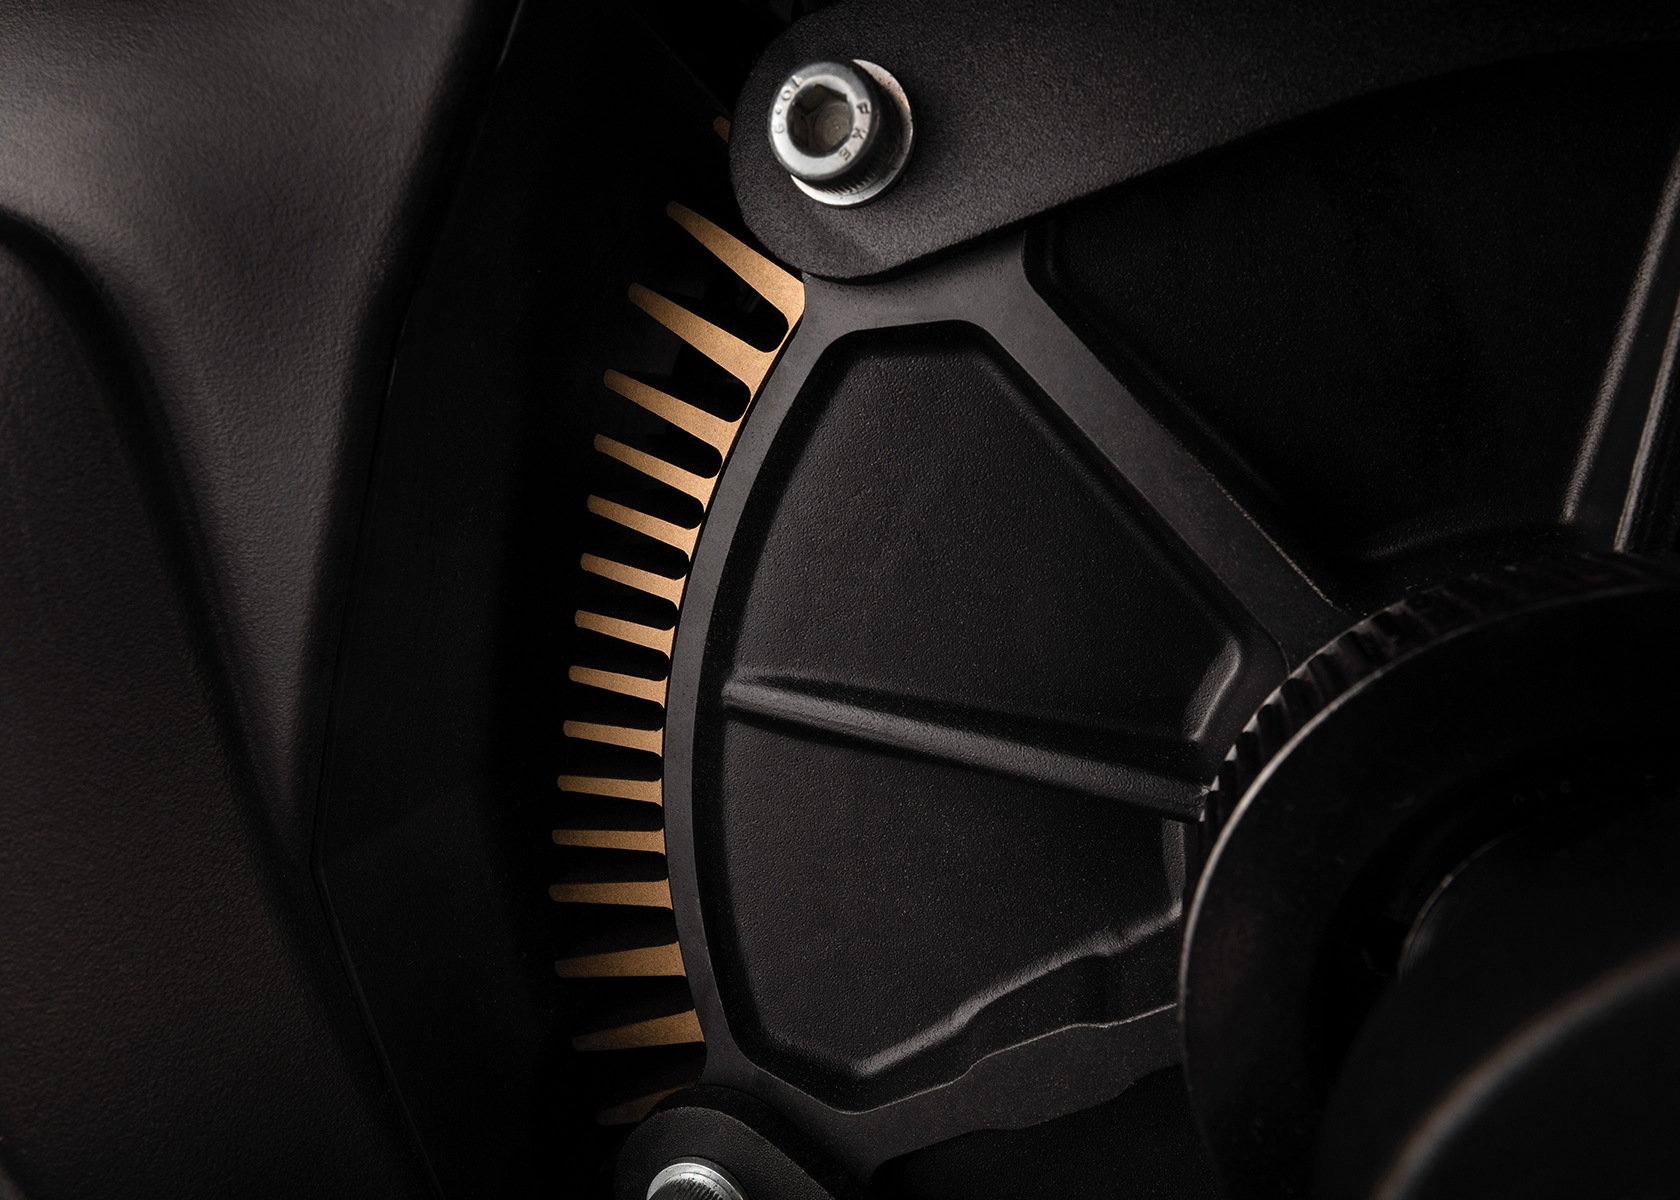 2018 Zero FXS Motorcycle: Motor